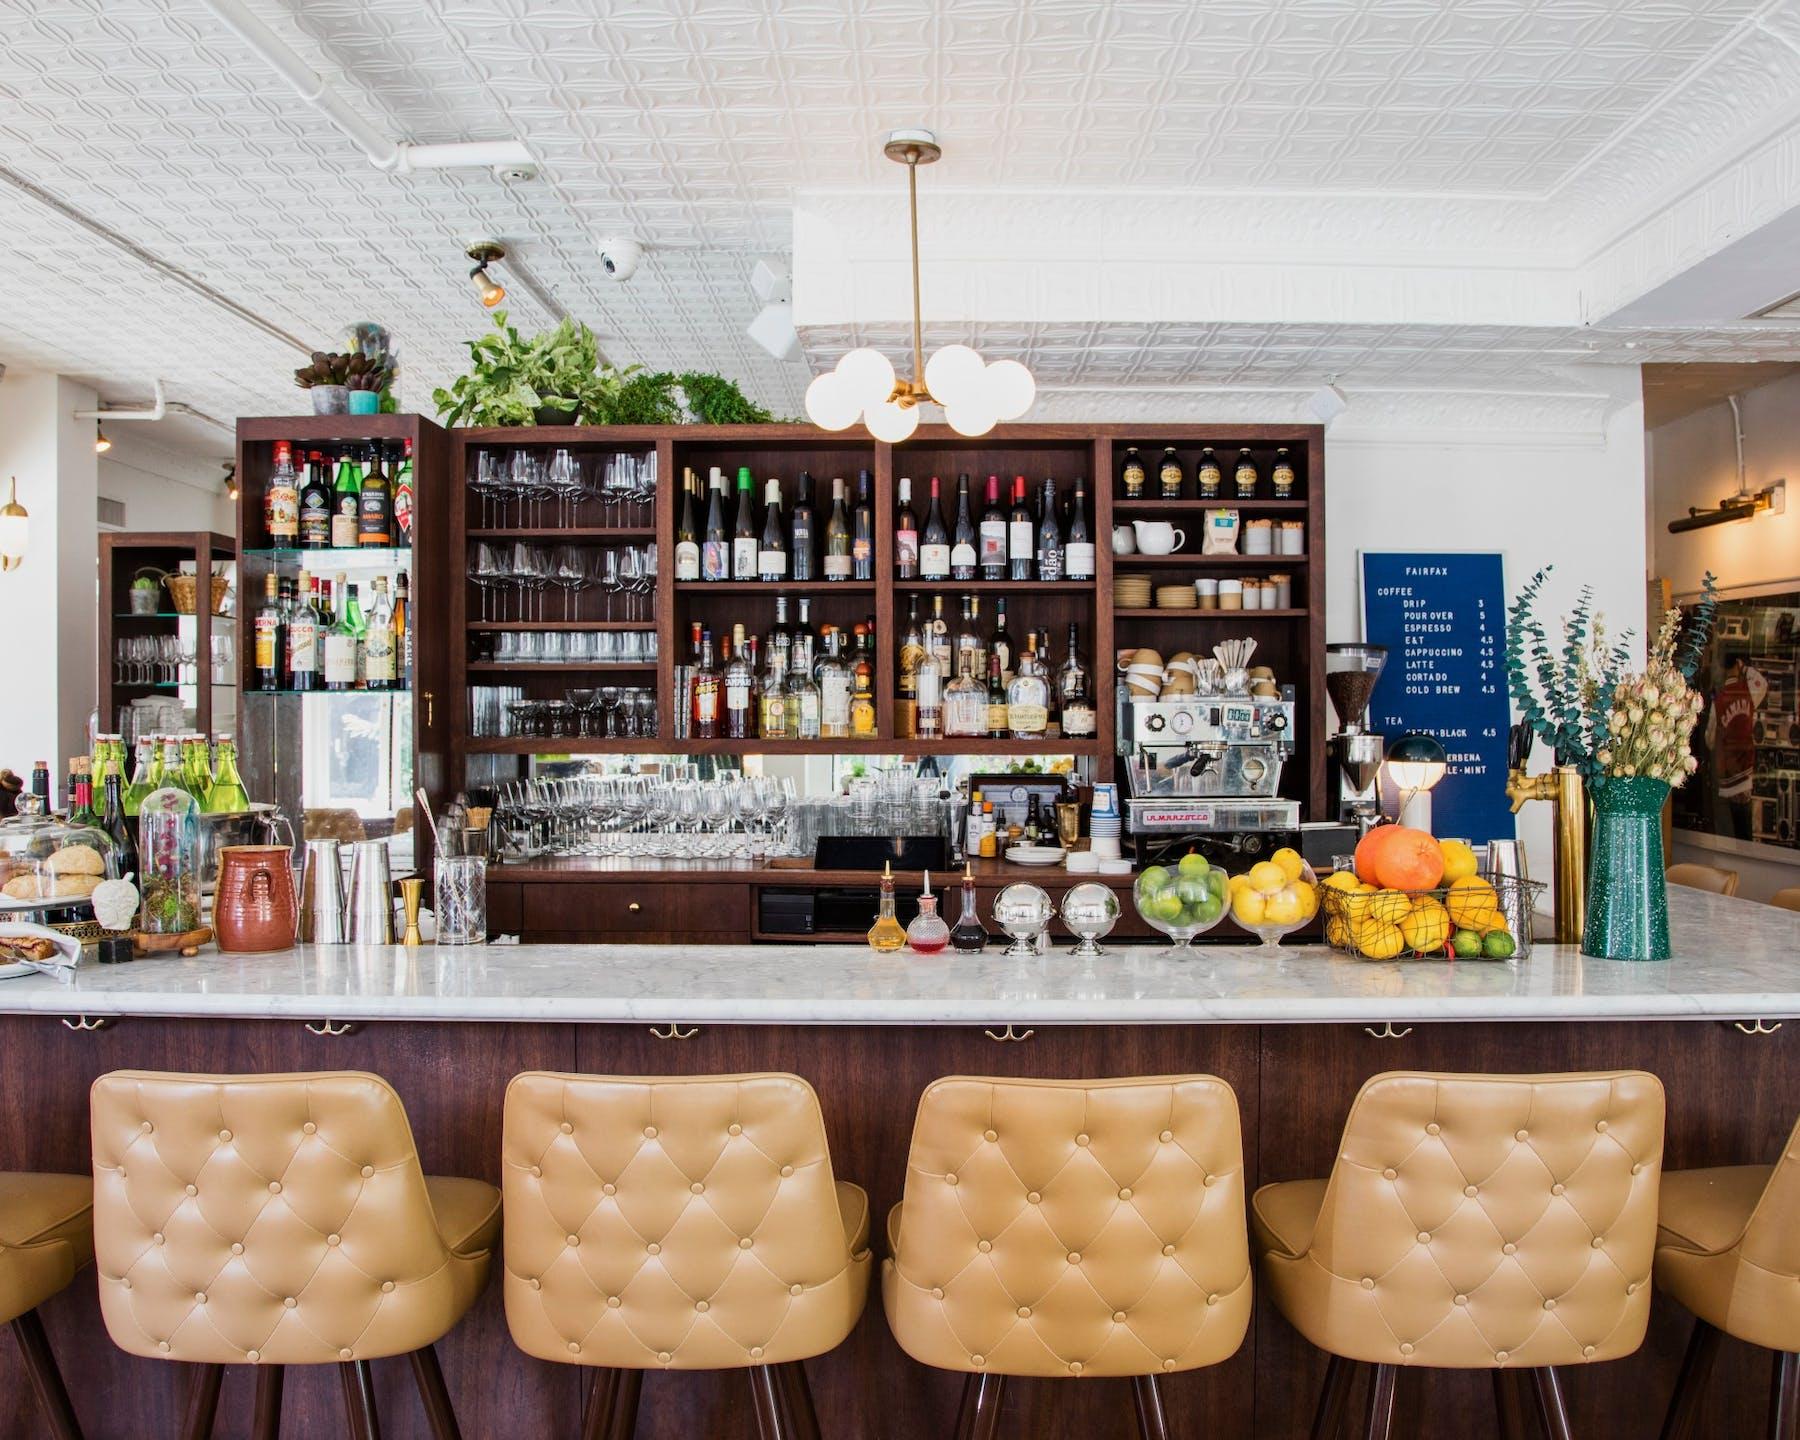 Fairfax bar stools and liquor stands